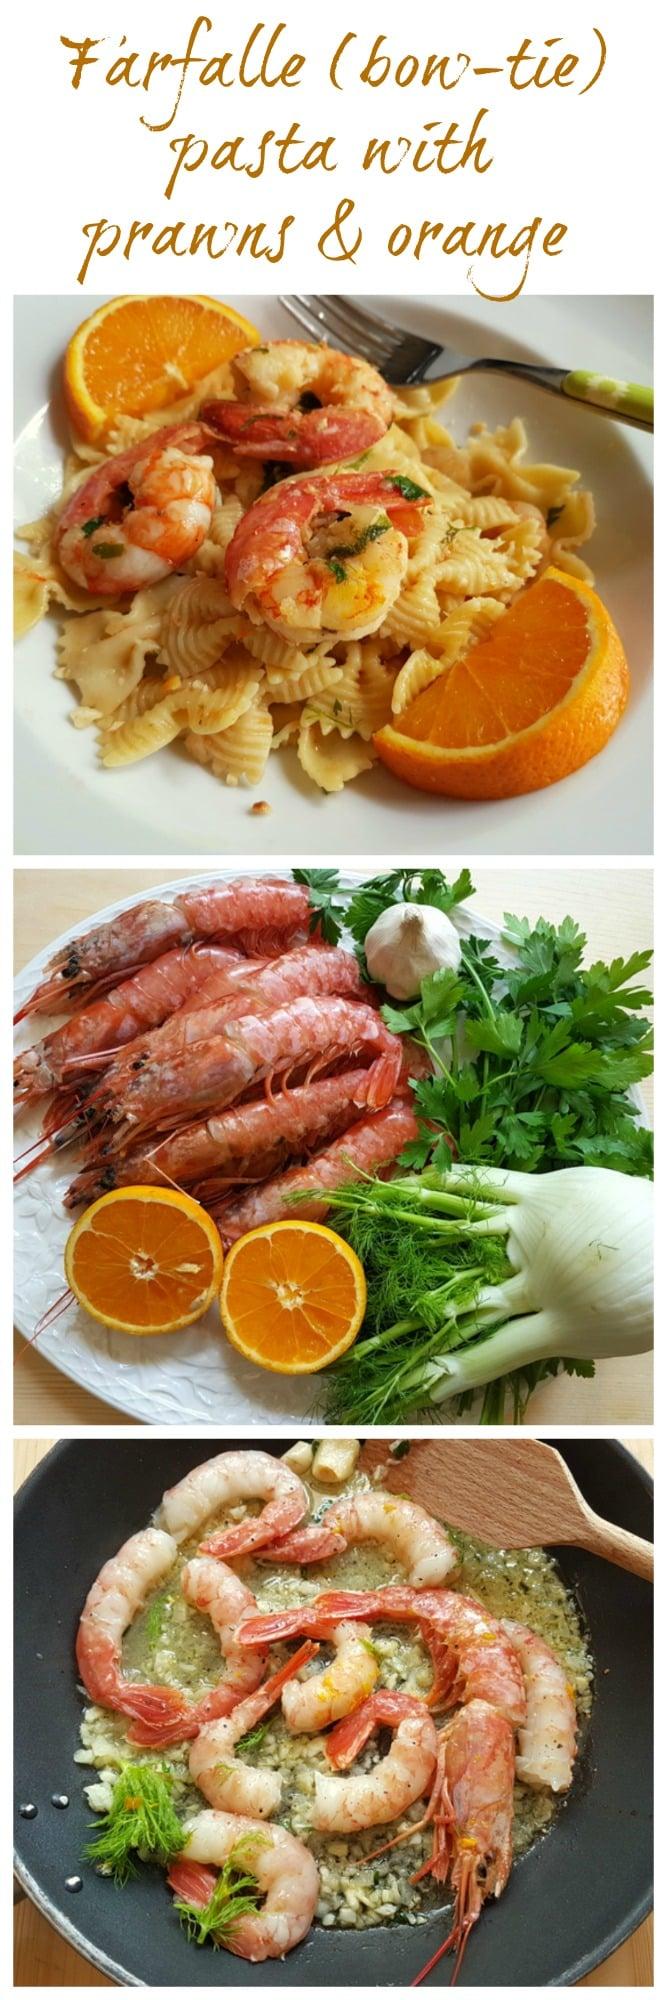 Farfalle pasta with prawns and orange